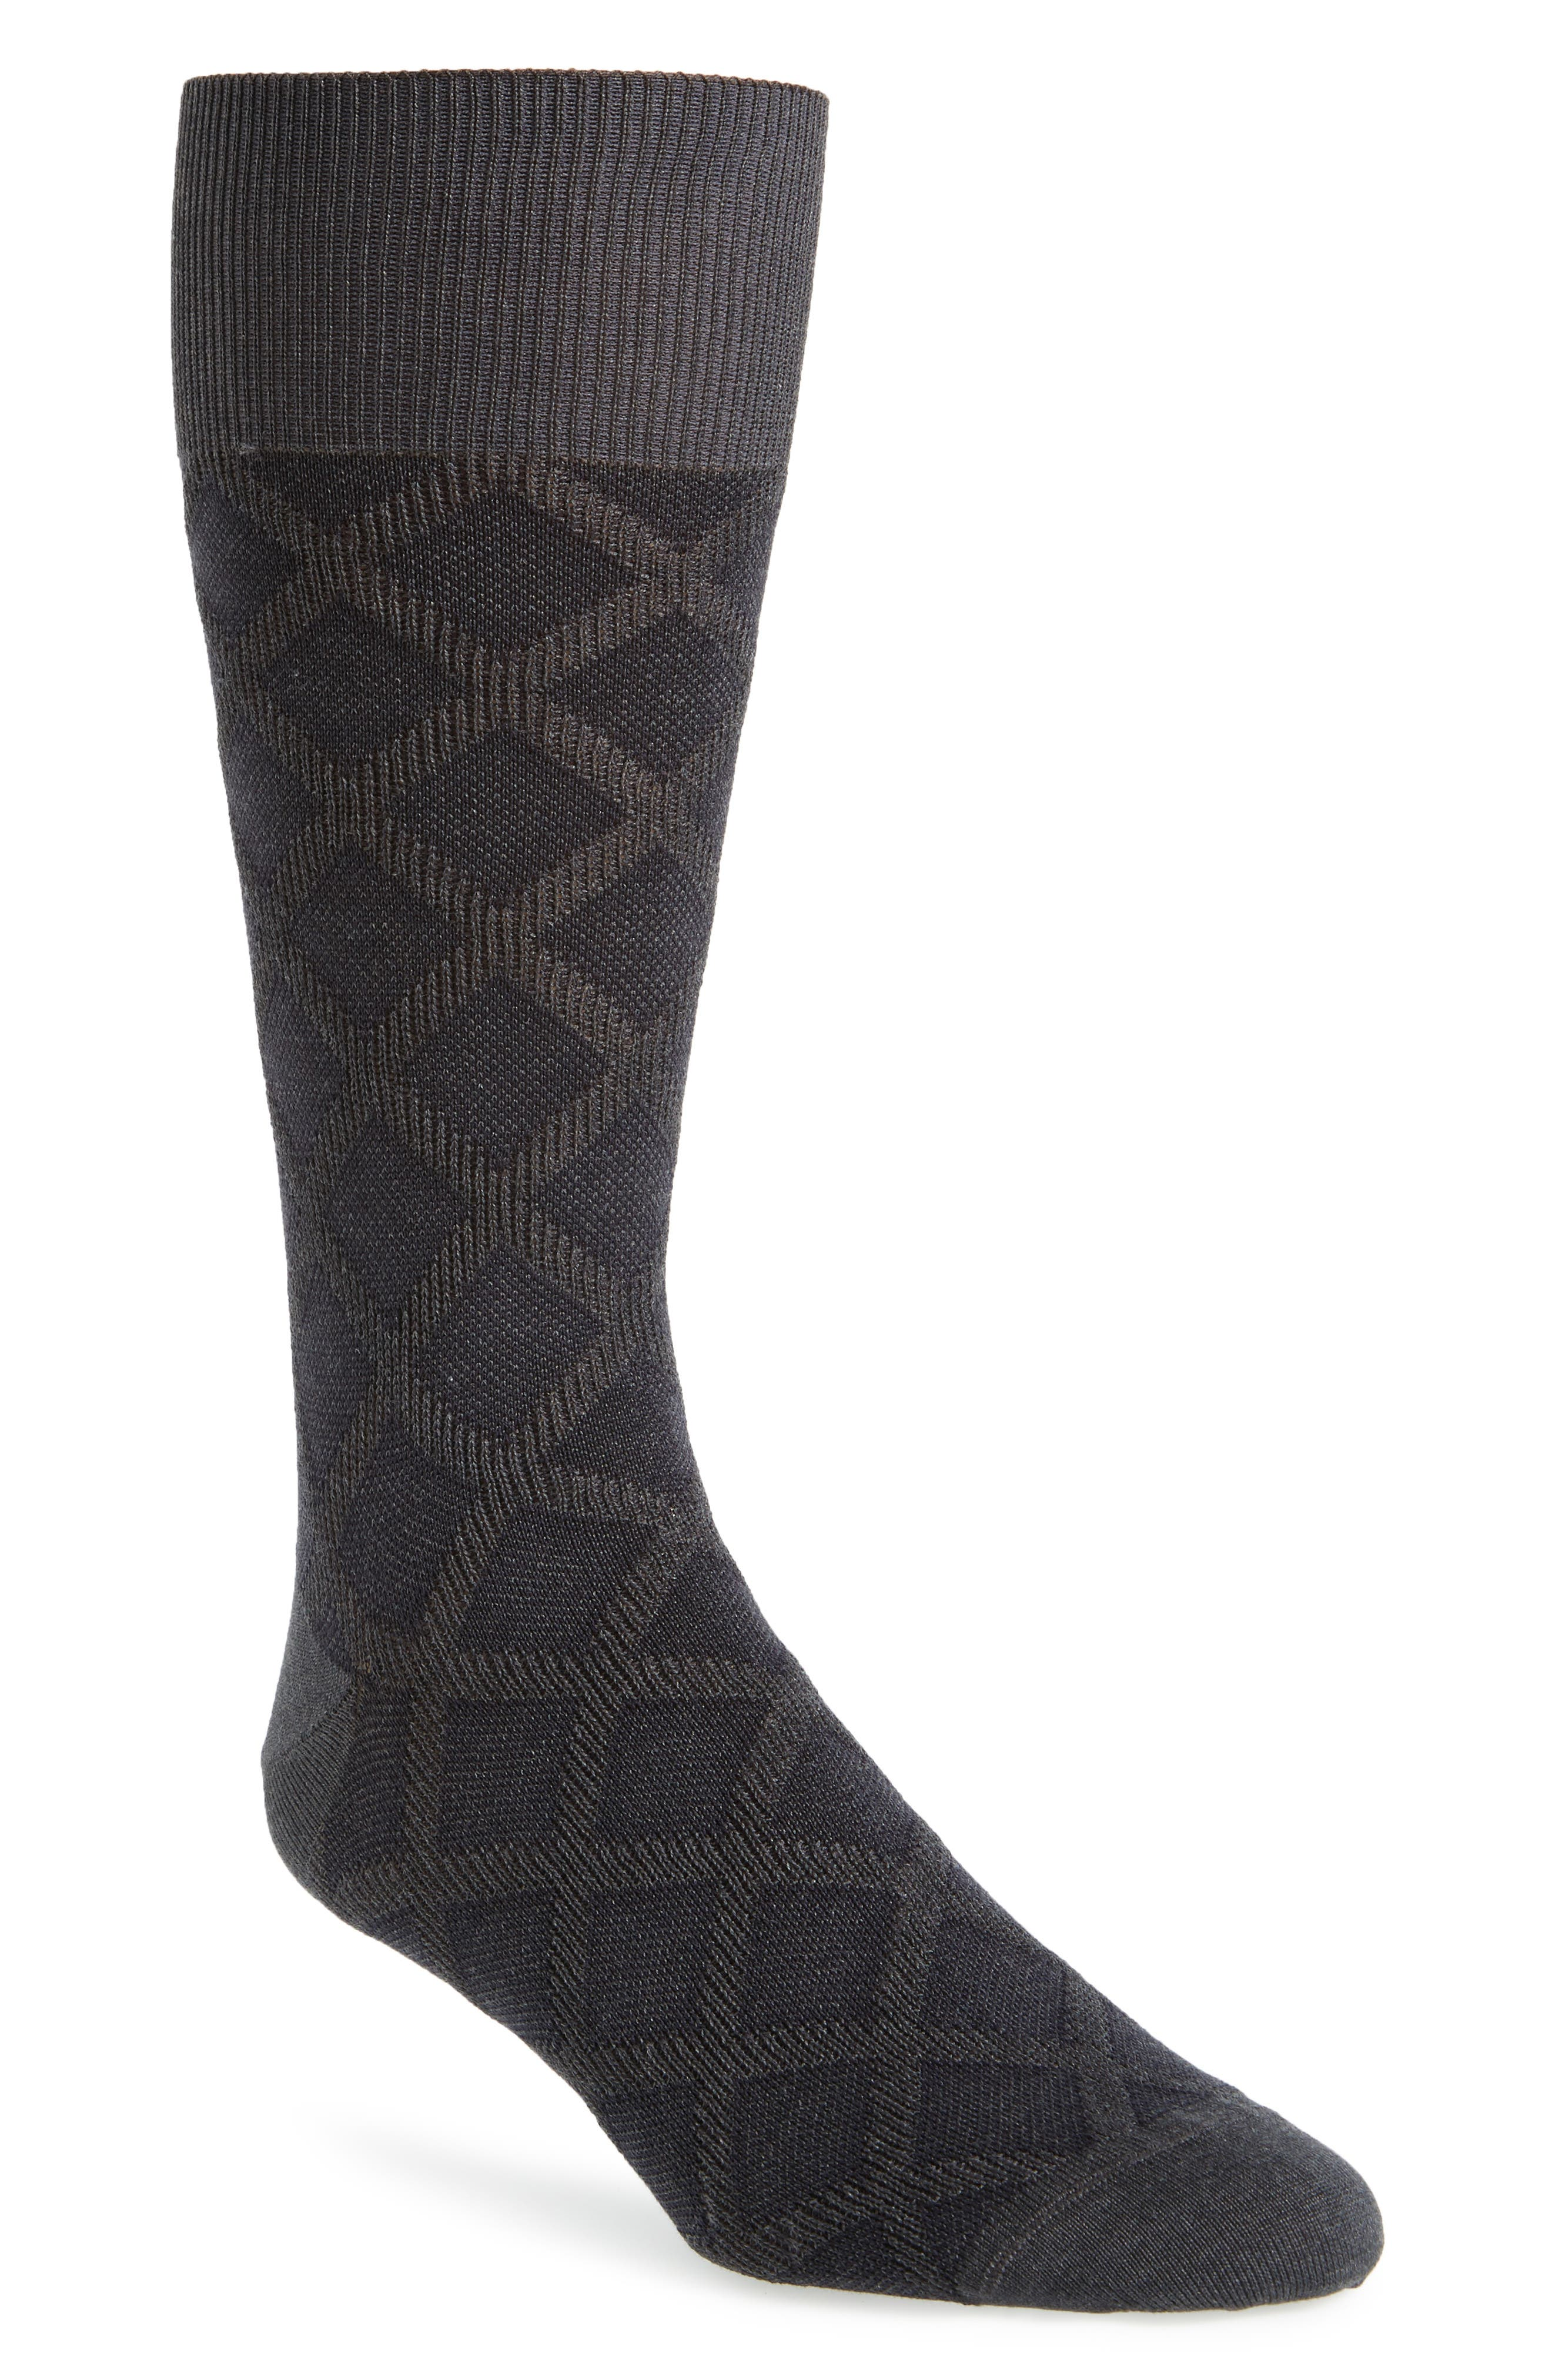 Argyle Socks,                             Main thumbnail 1, color,                             021